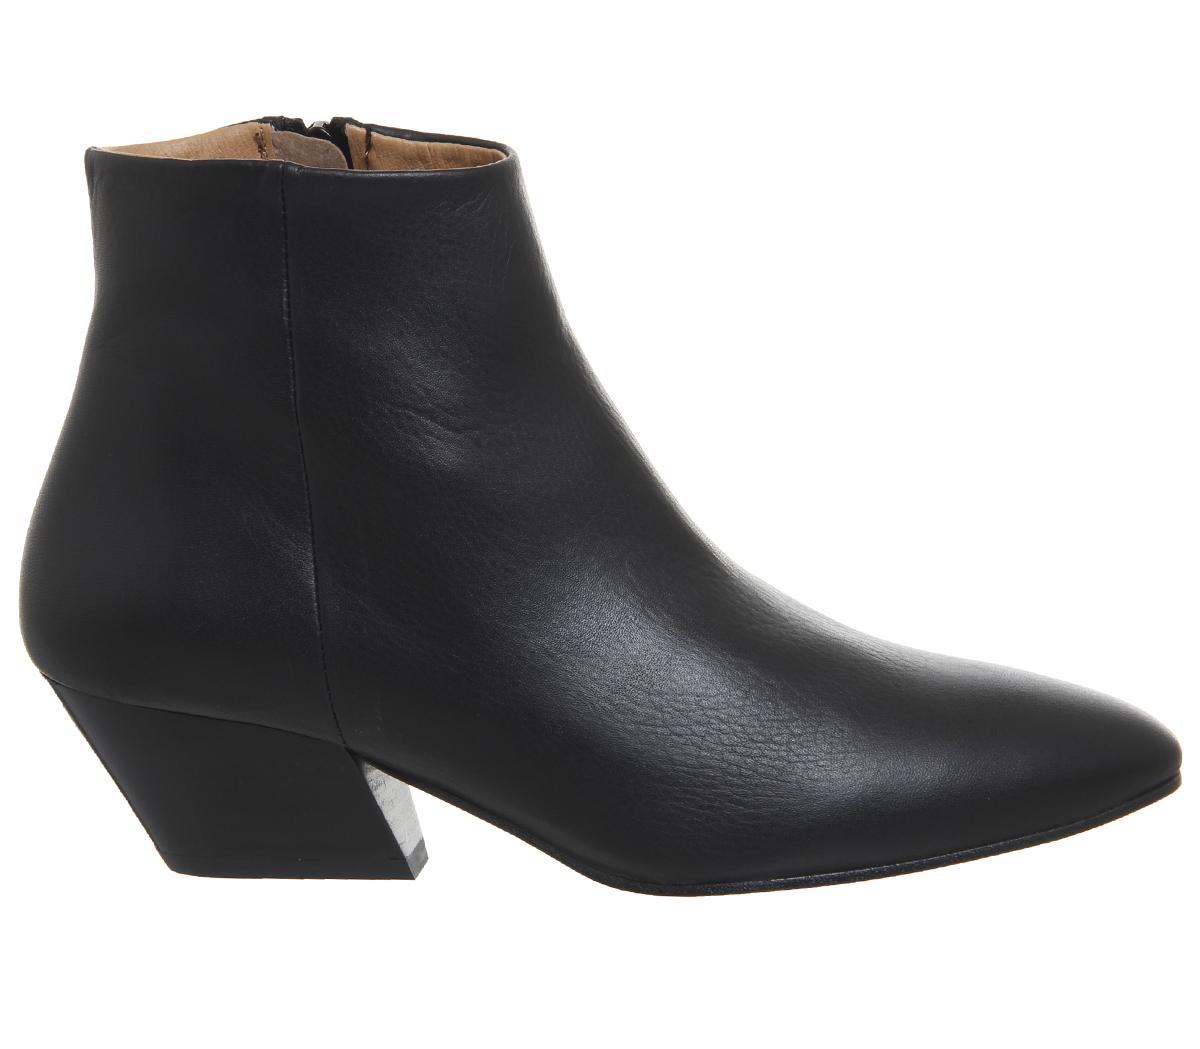 Damenschuhe Damenschuhe Damenschuhe Office Atone Western Block Heel Stiefel BLACK LEATHER BLACK HEEL Stiefel b55a9f